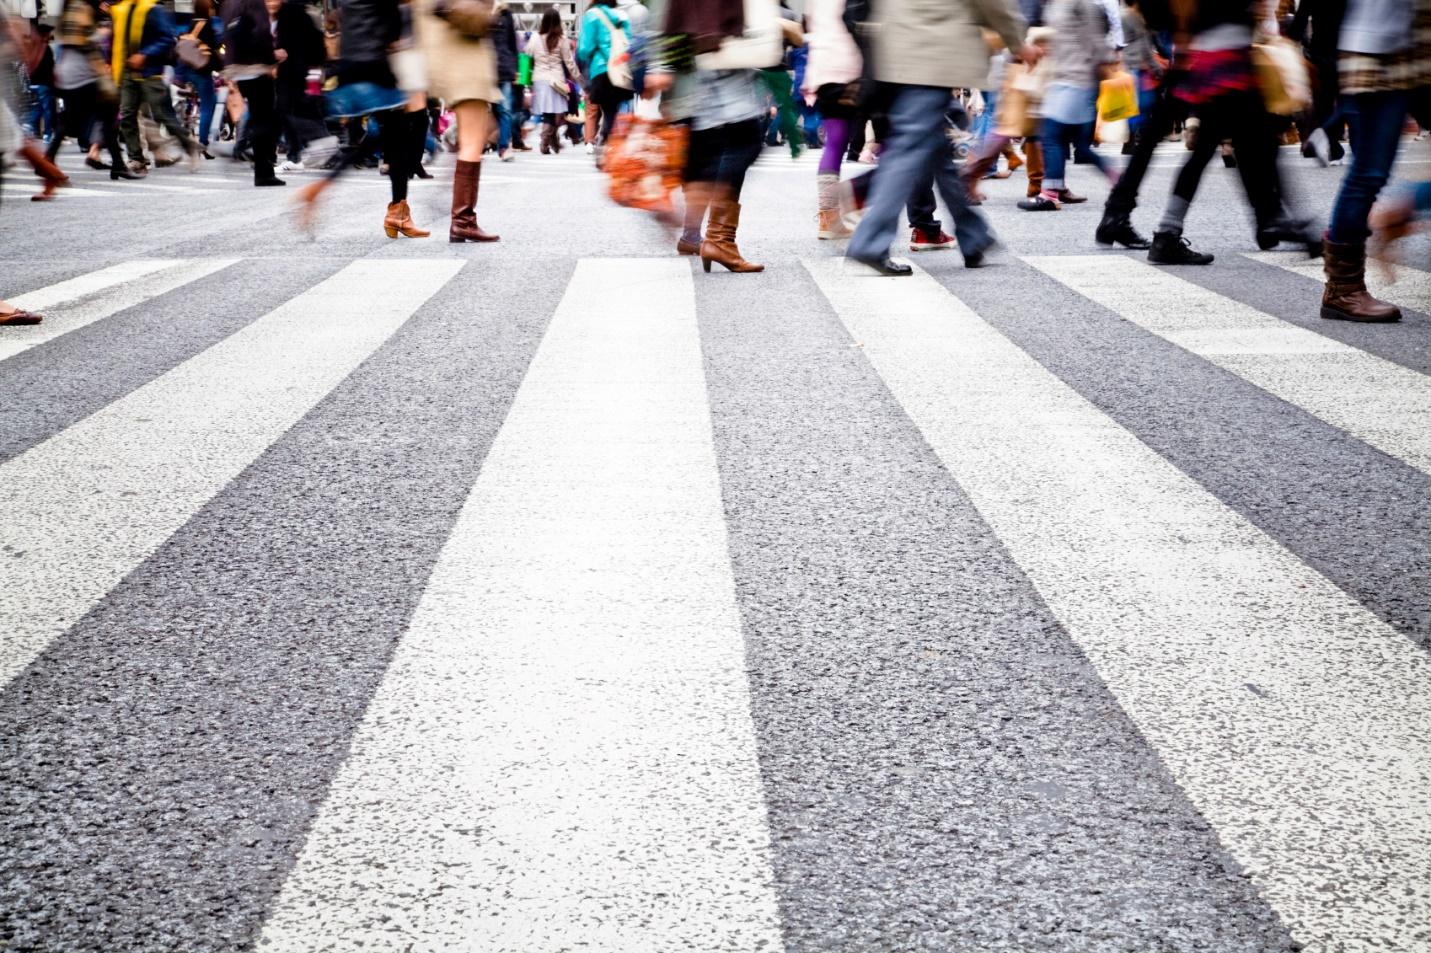 Source:  https://www.movalegal.com/wp-content/uploads/2017/05/Pedestrian_Crossing.jpg